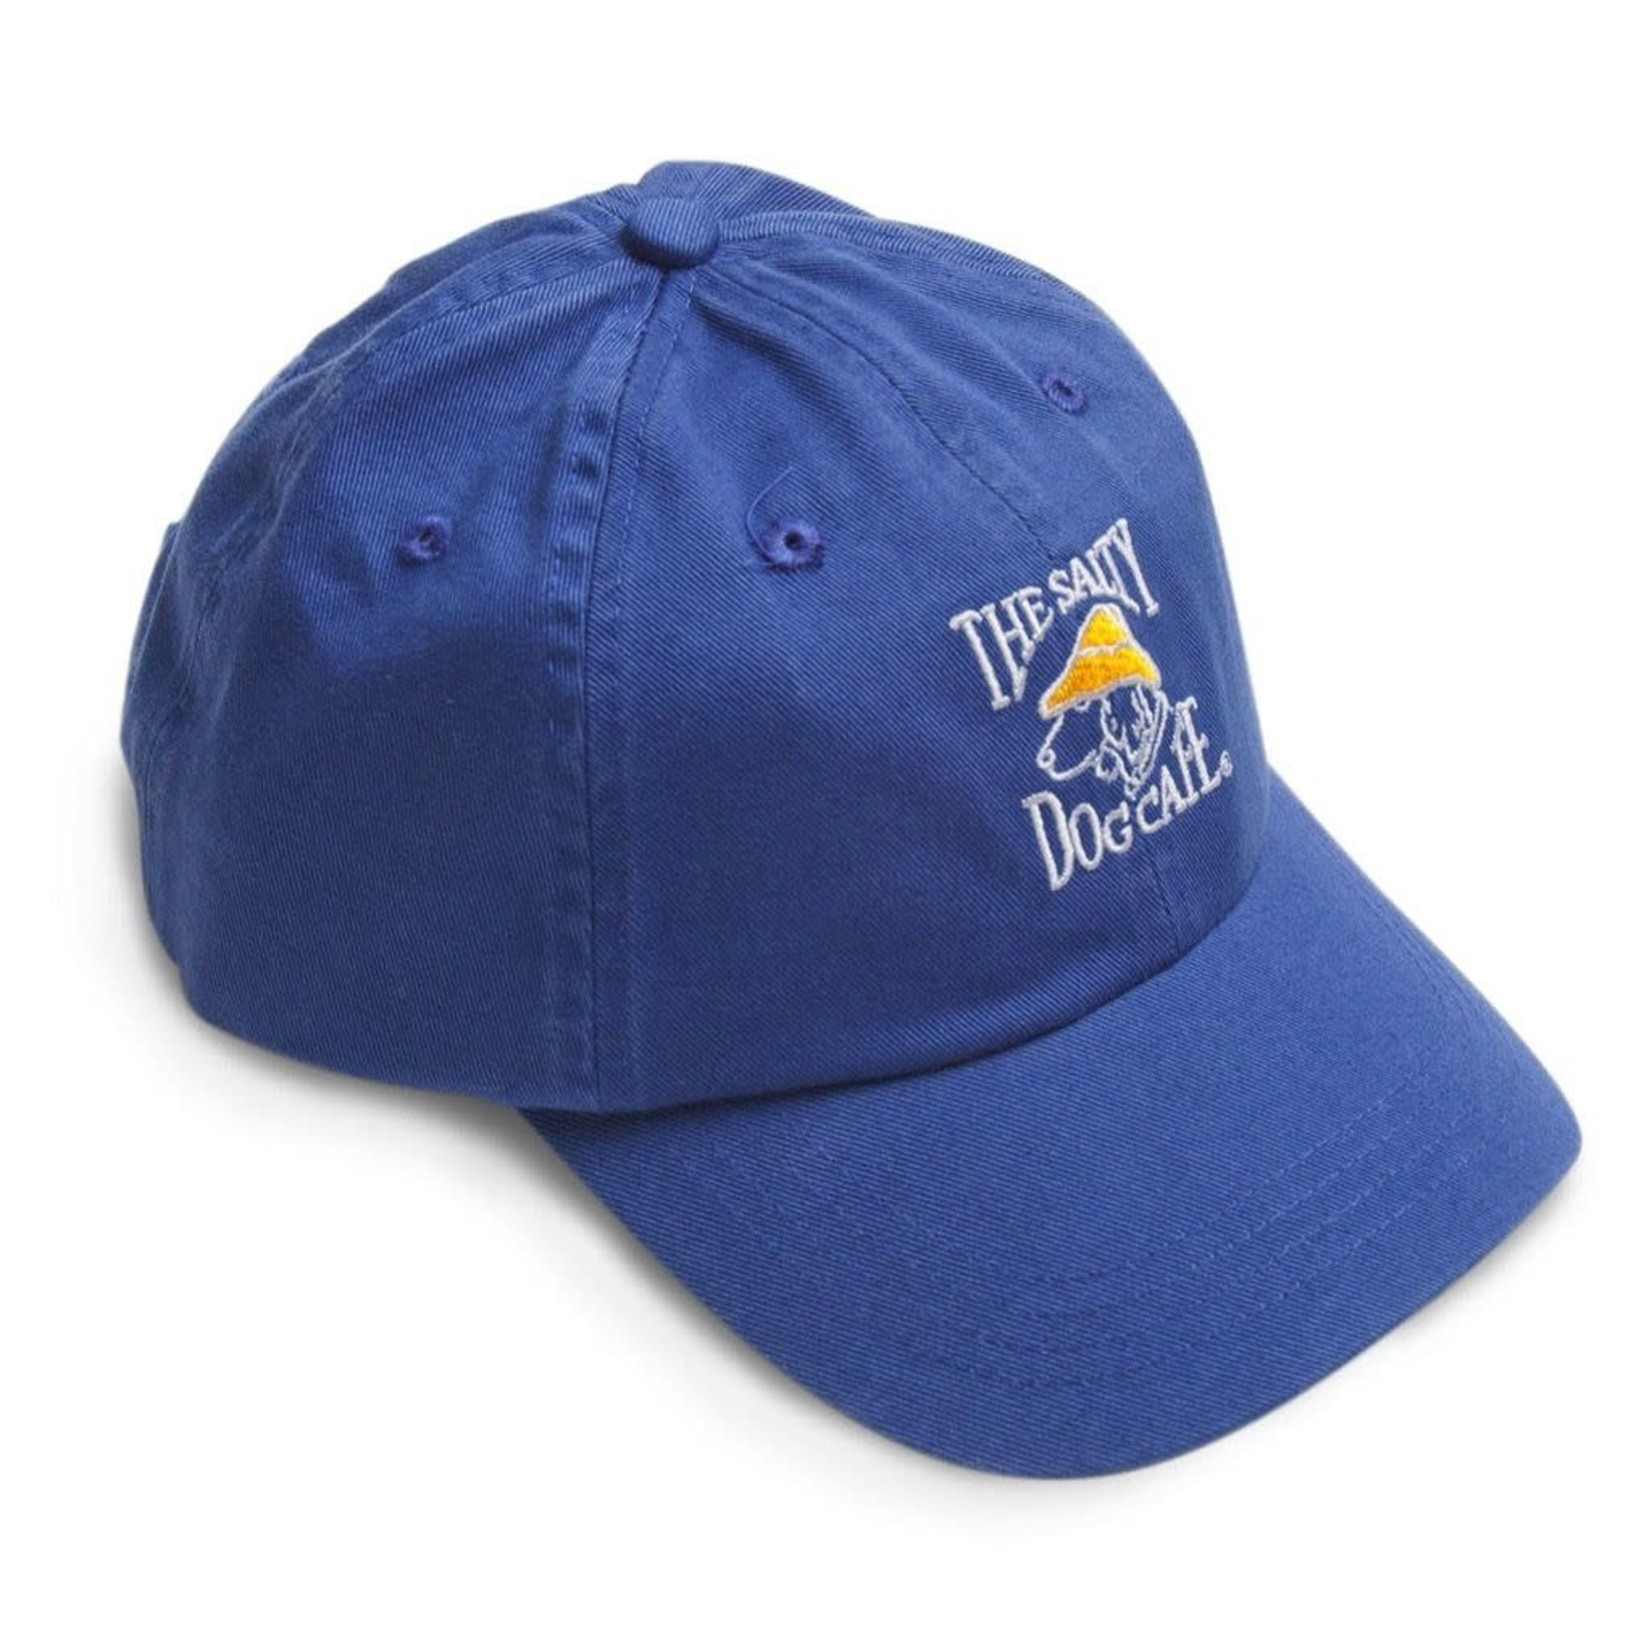 Hat - Youth 5-12 - Royal